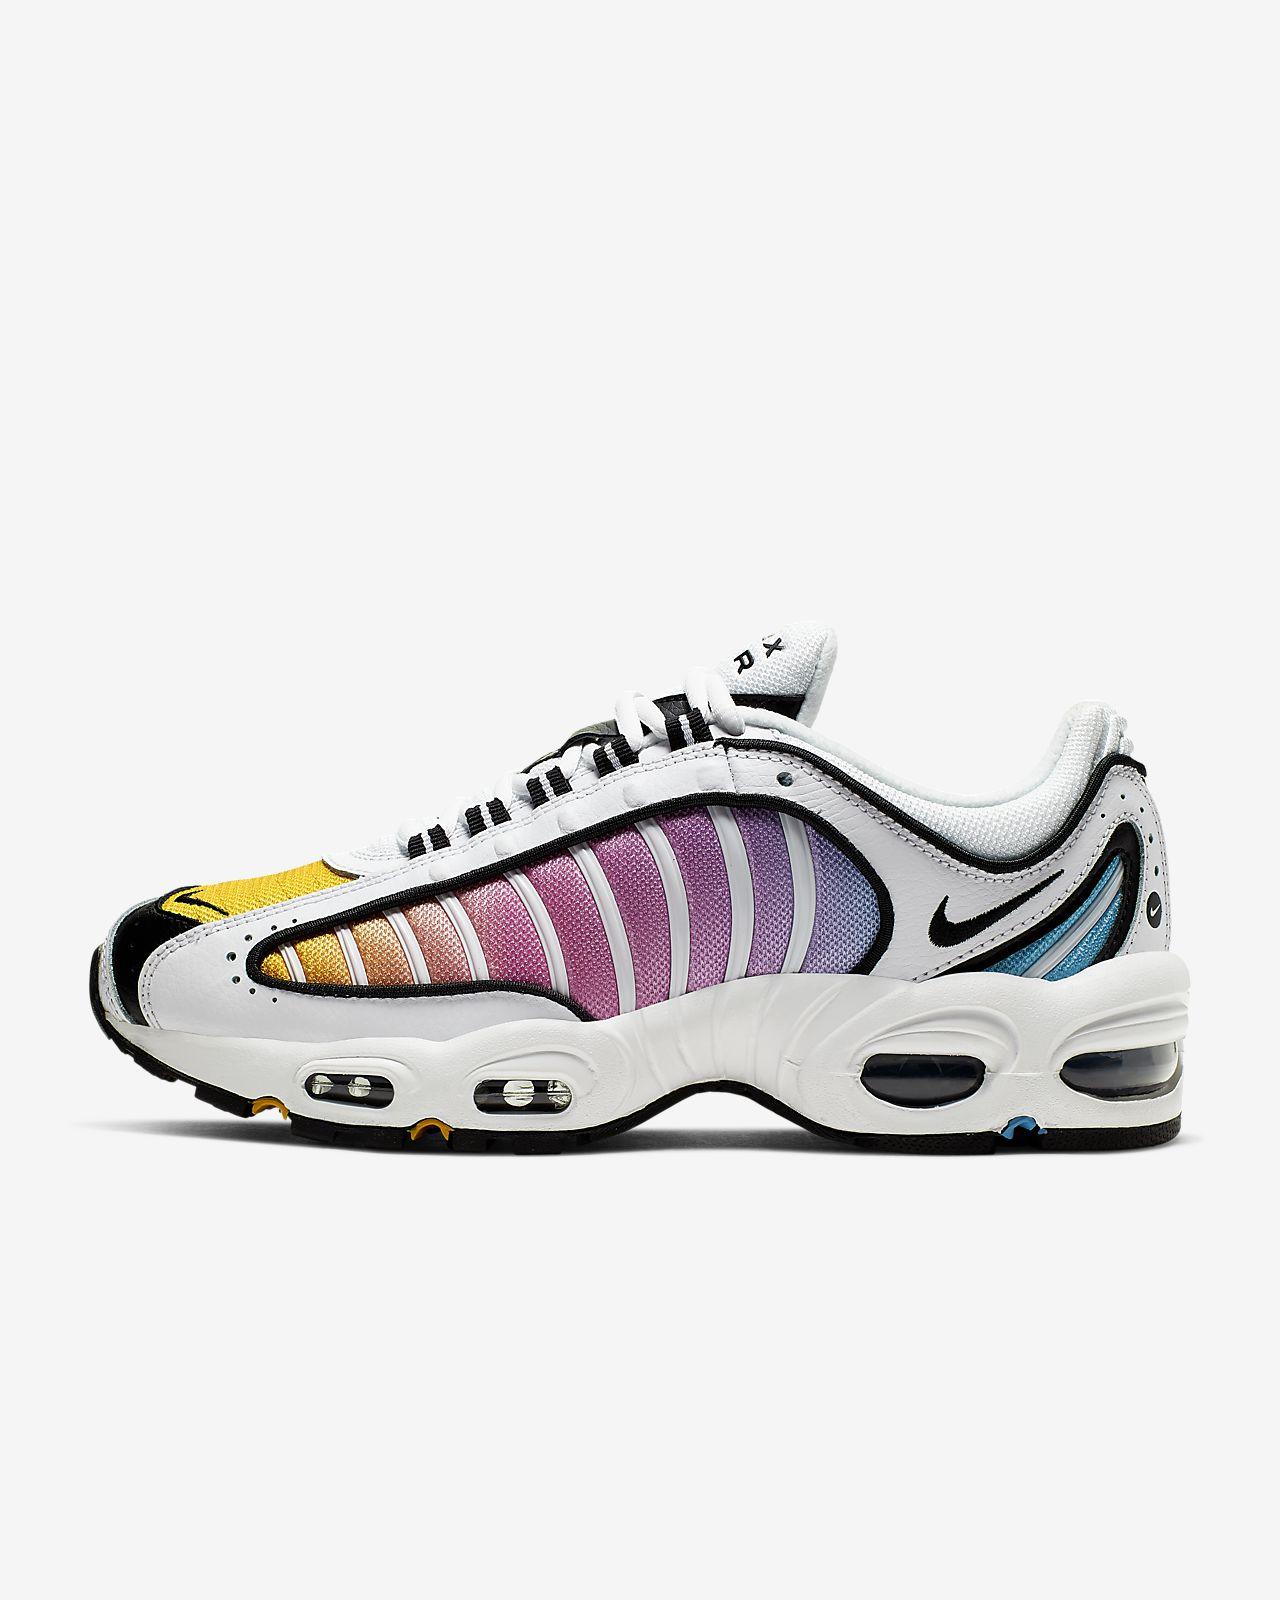 Nike Air Max 1 Herren Running Schuhe WeißUniversity Blau